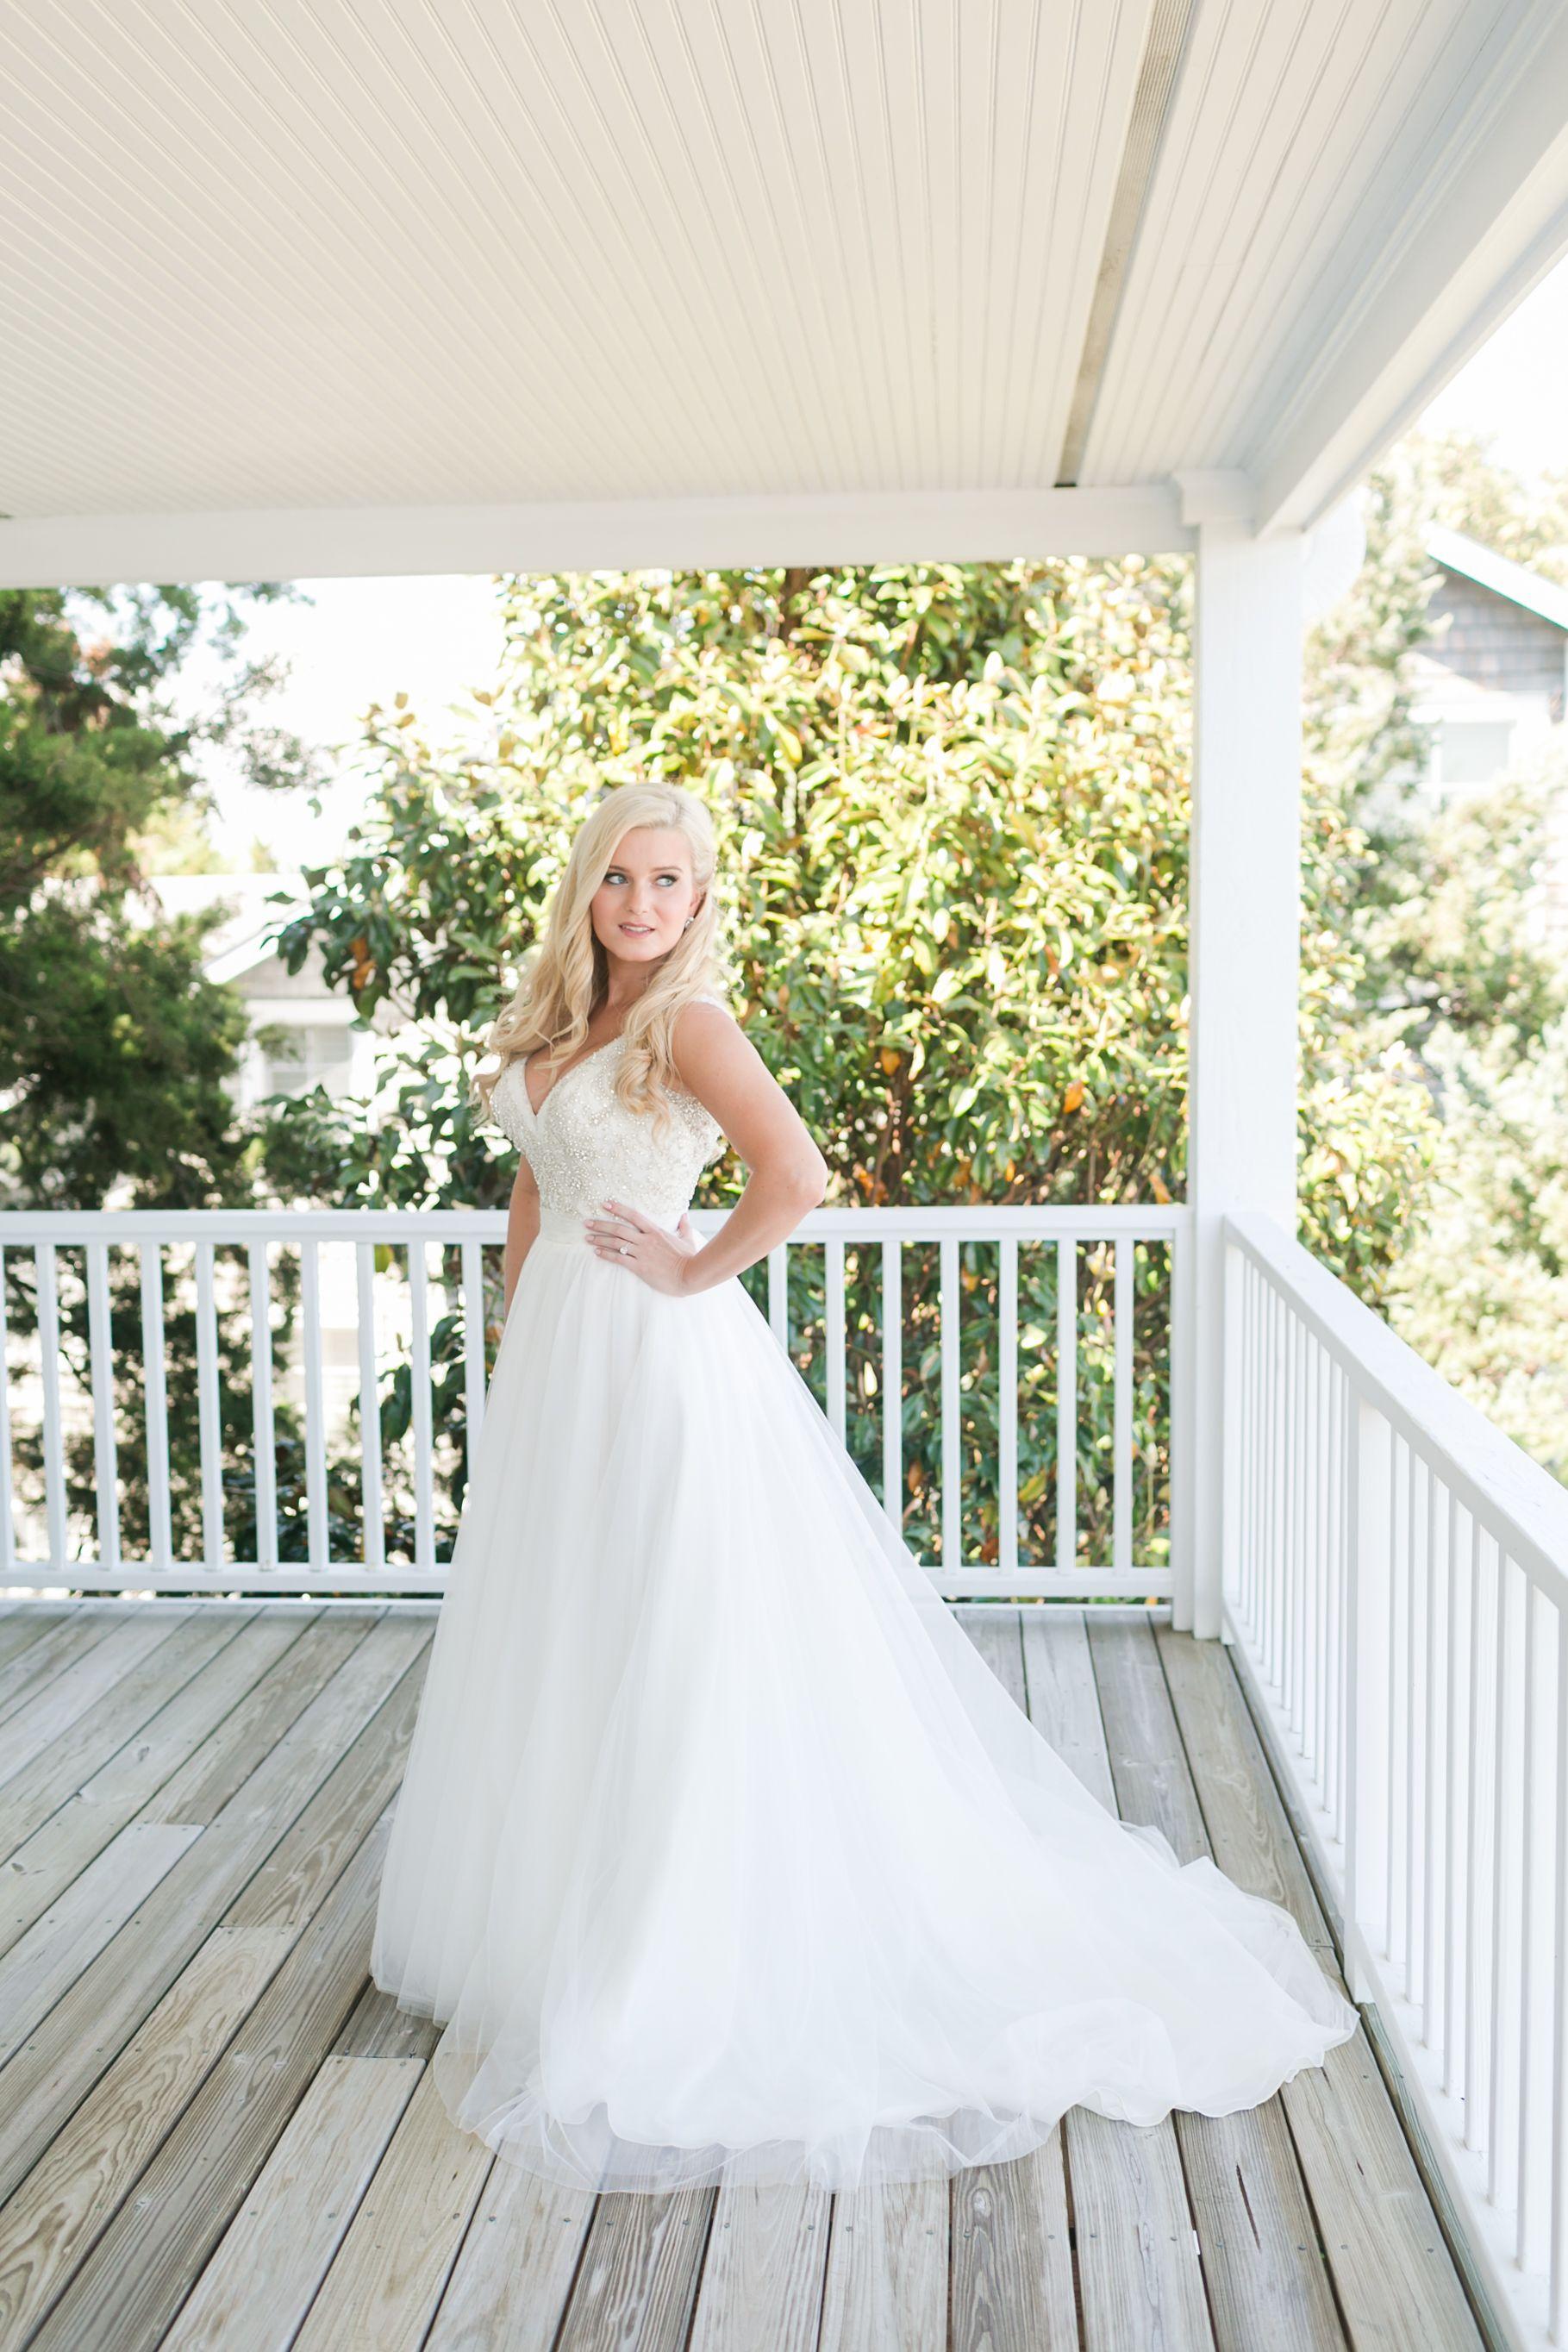 Coastal Knot Bride Rachel in Madison James Madison